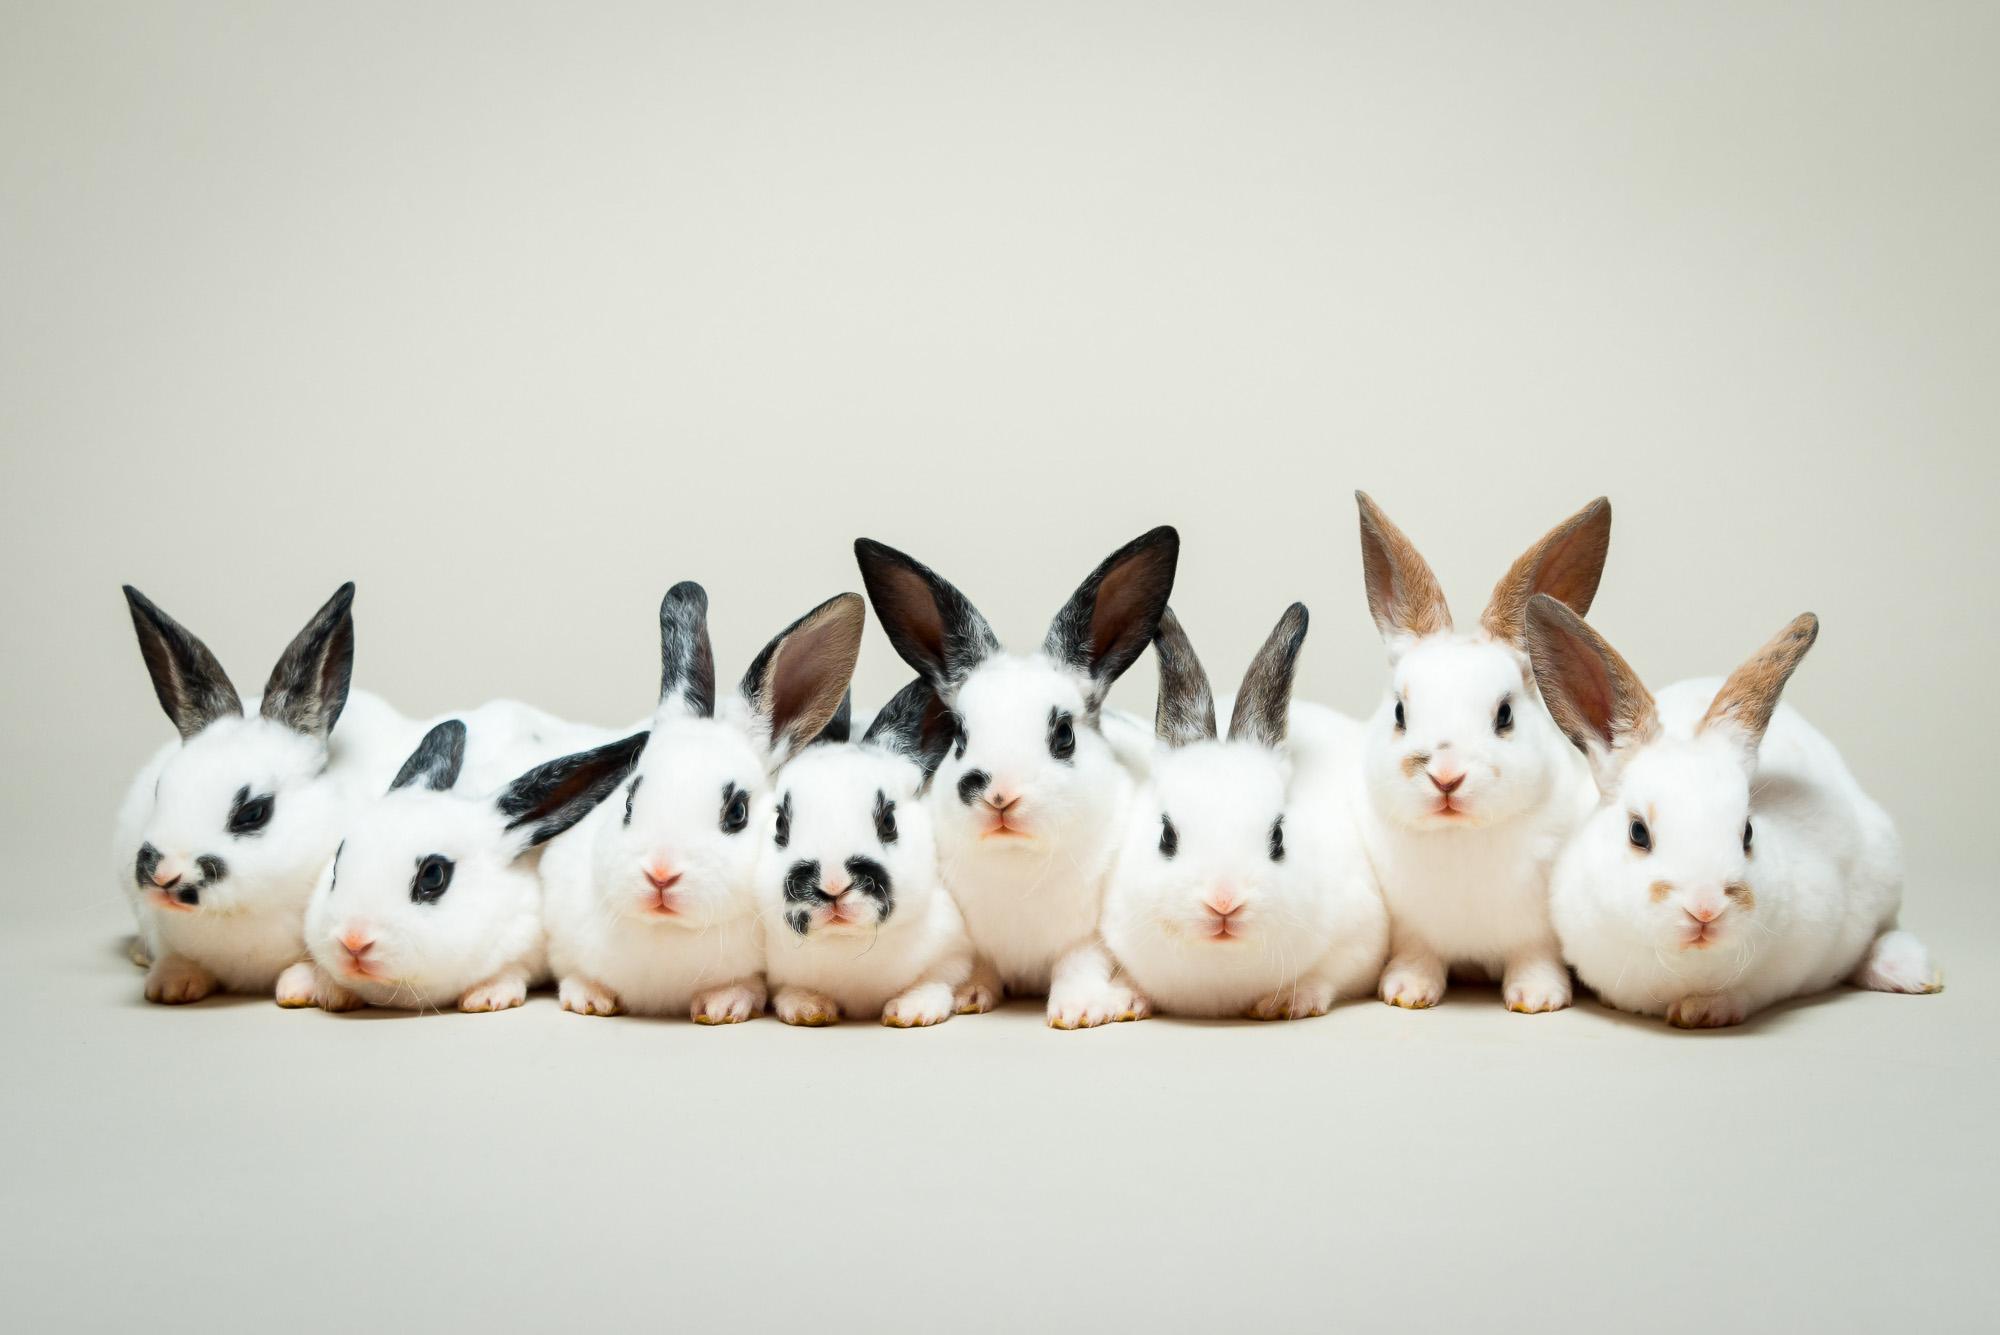 LupinBay_0098_Baby_Bunny_Rabbits-9056_LR.jpg